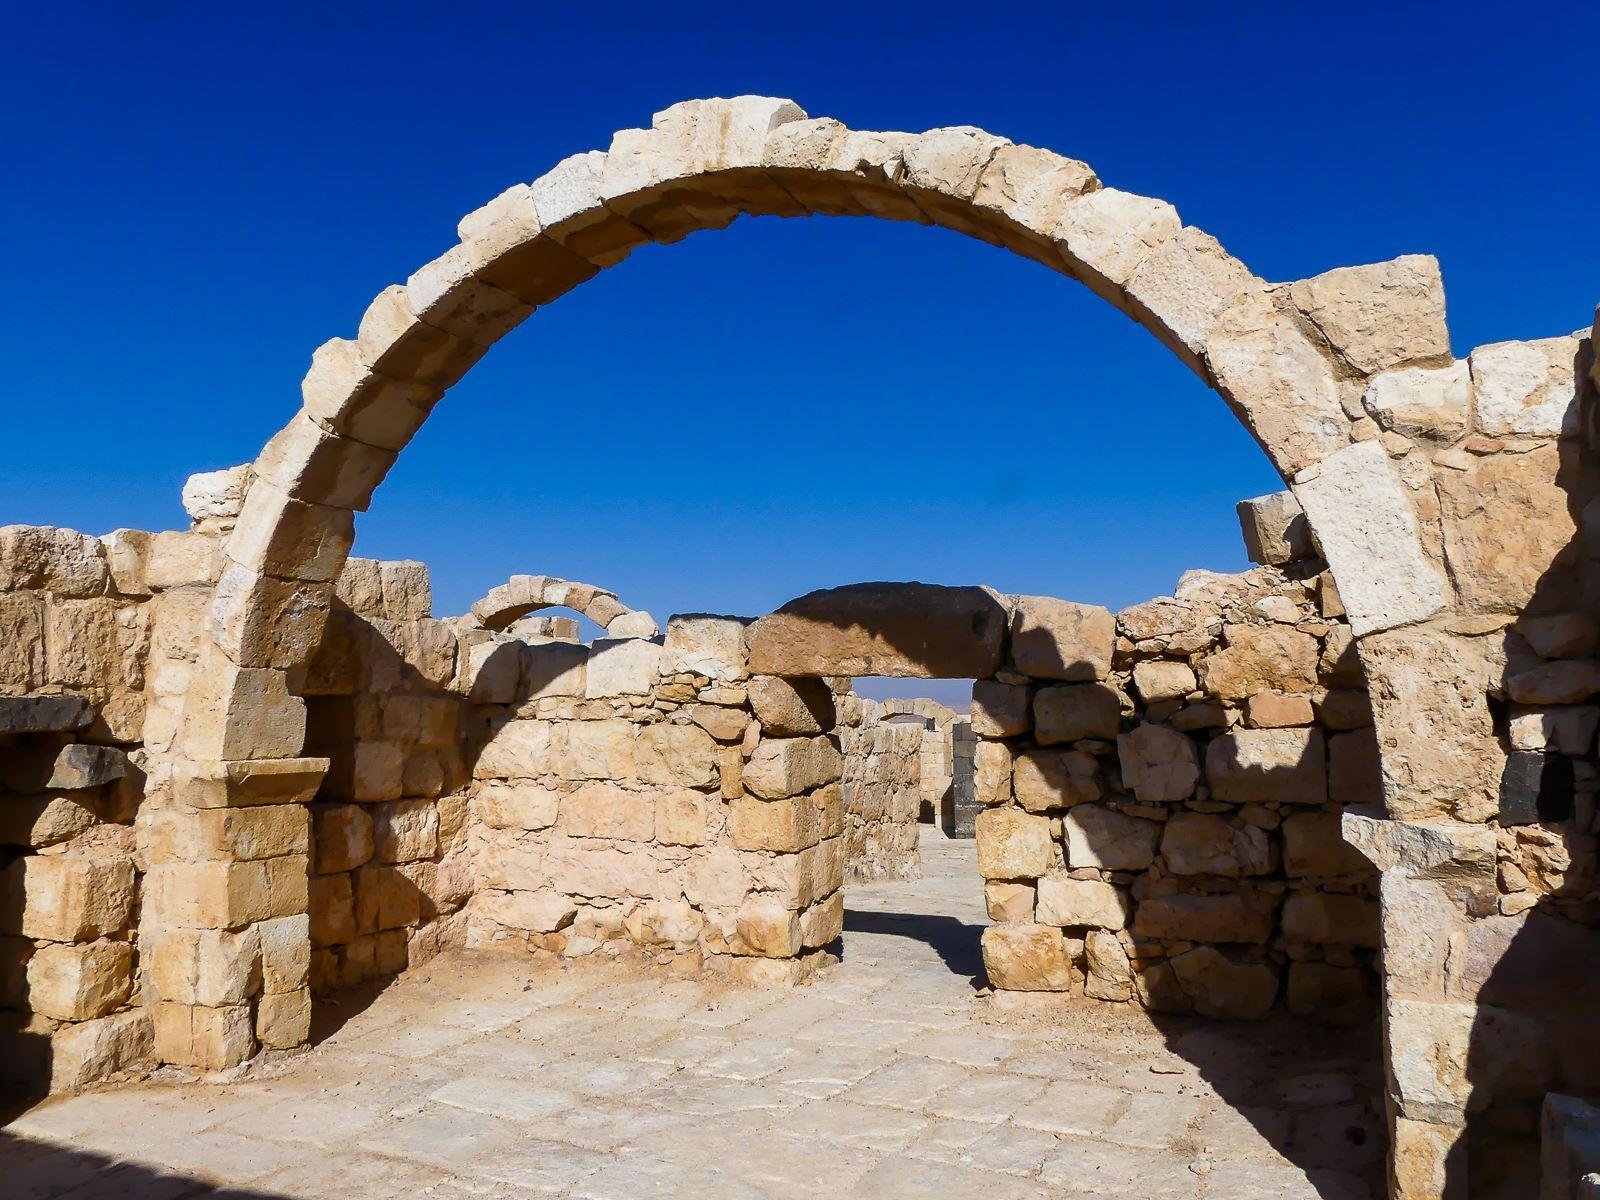 Jordanie - châteaux du désert - Qasr Al Hallabat